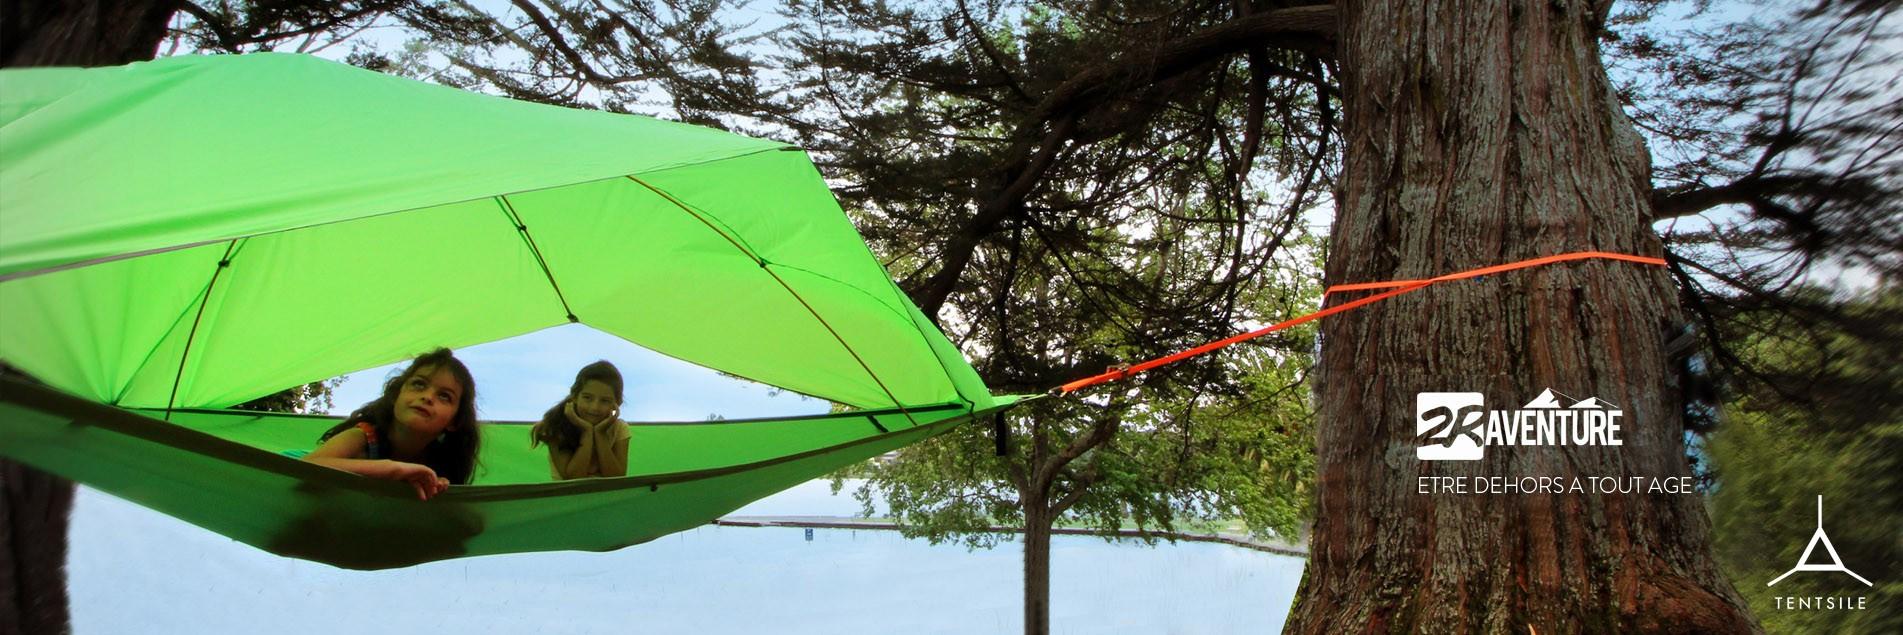 Tentes suspendues aux arbres Tentsile